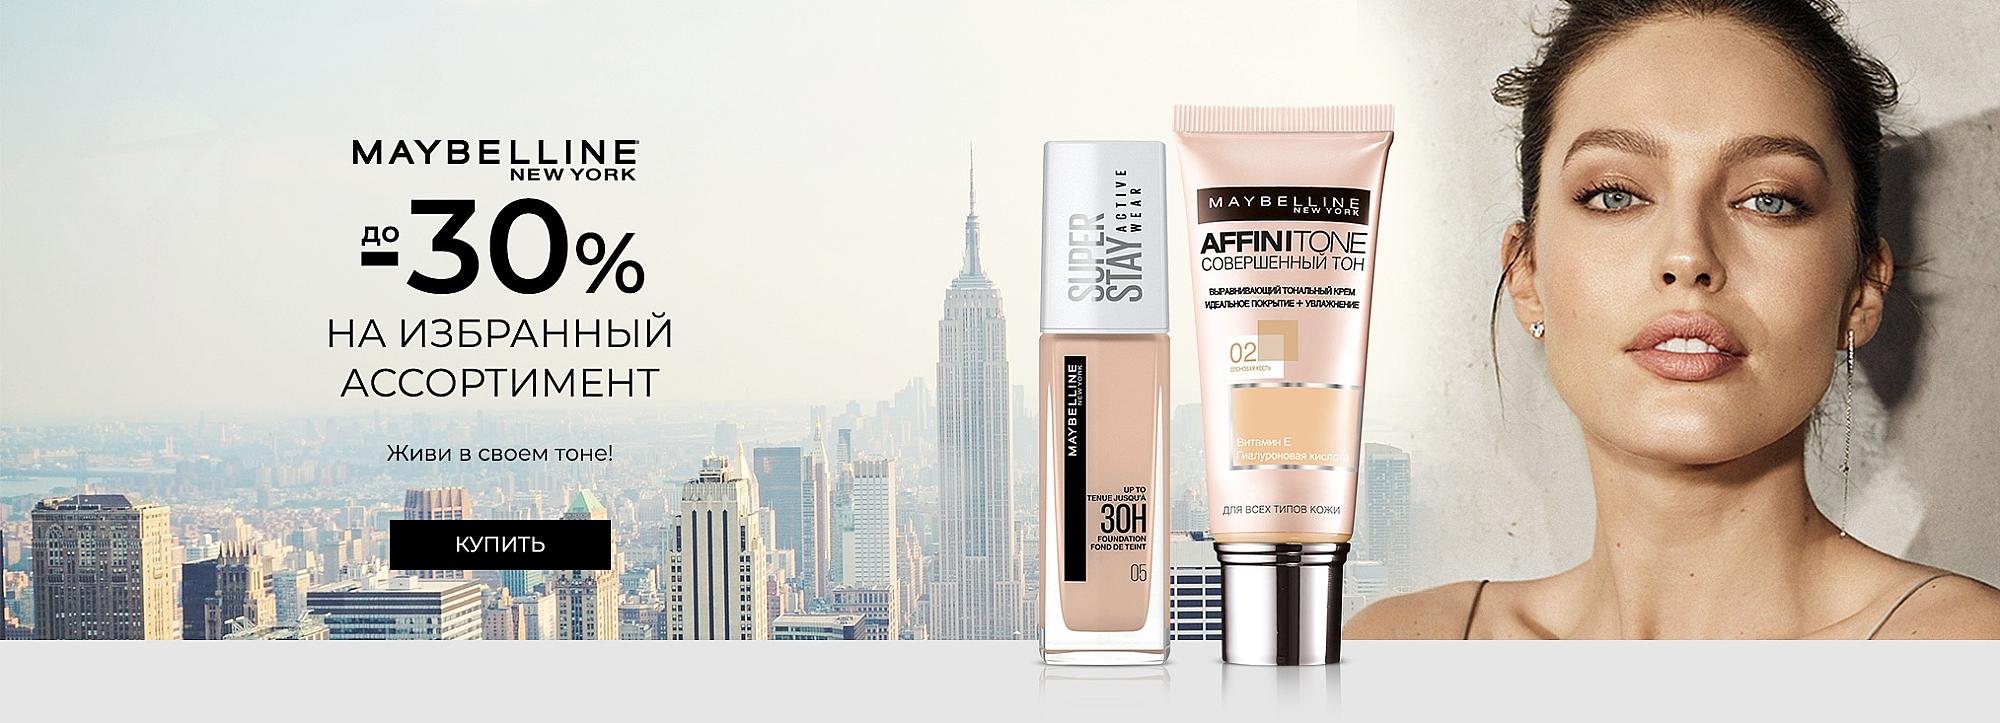 Maybelline New York_акции